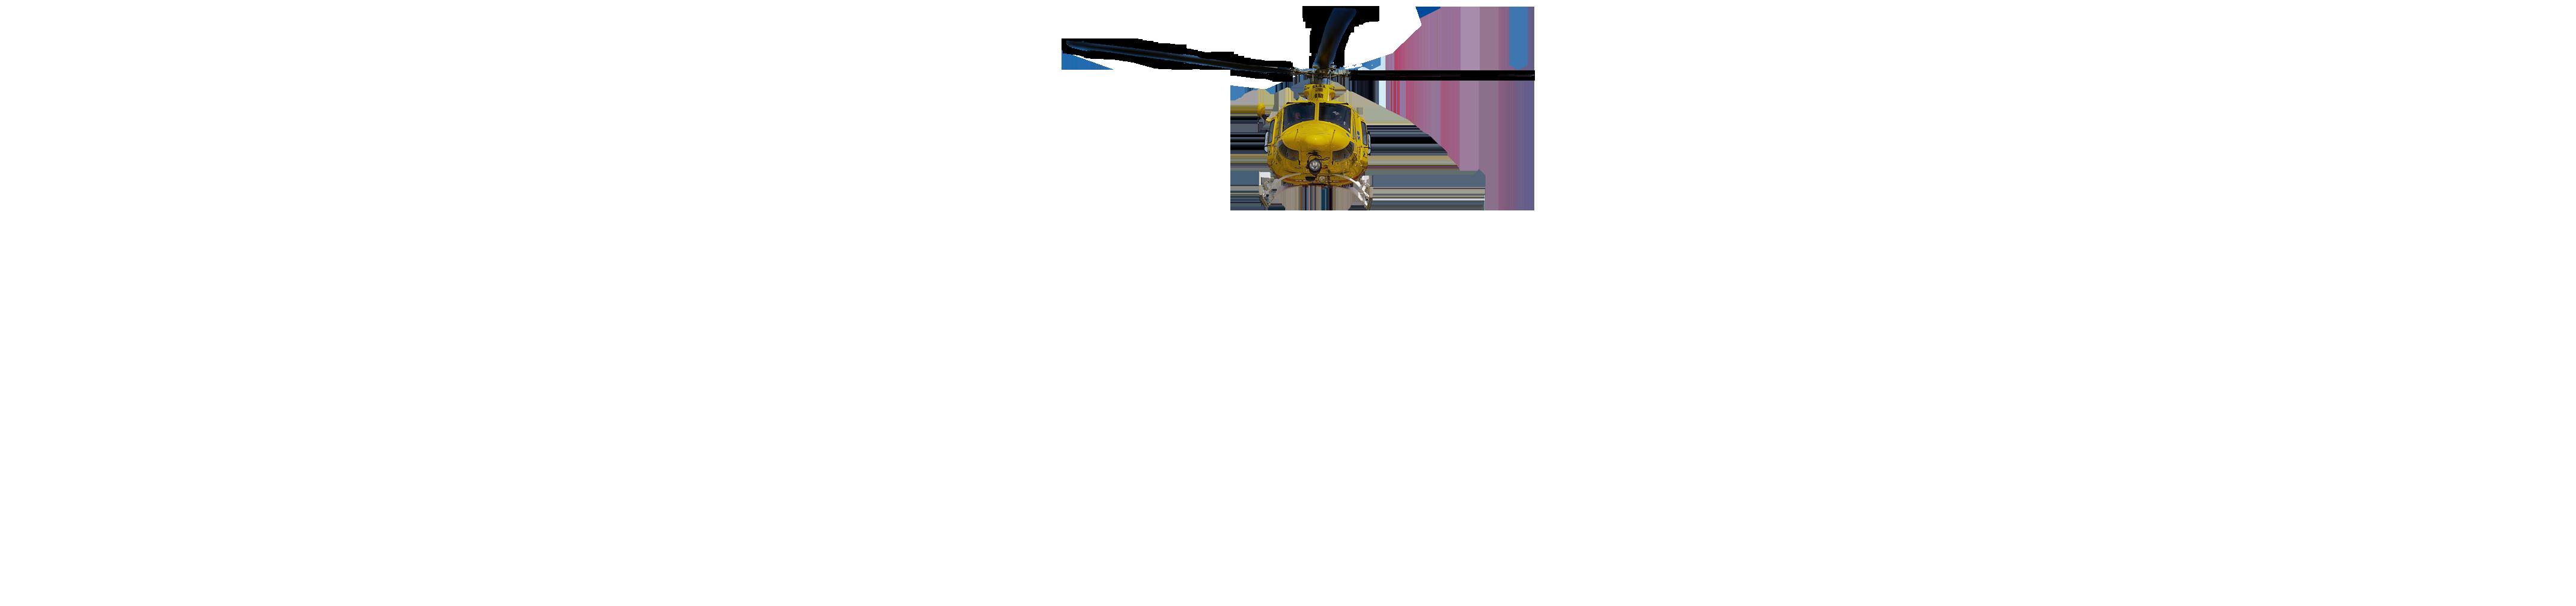 helicoptero-lidar